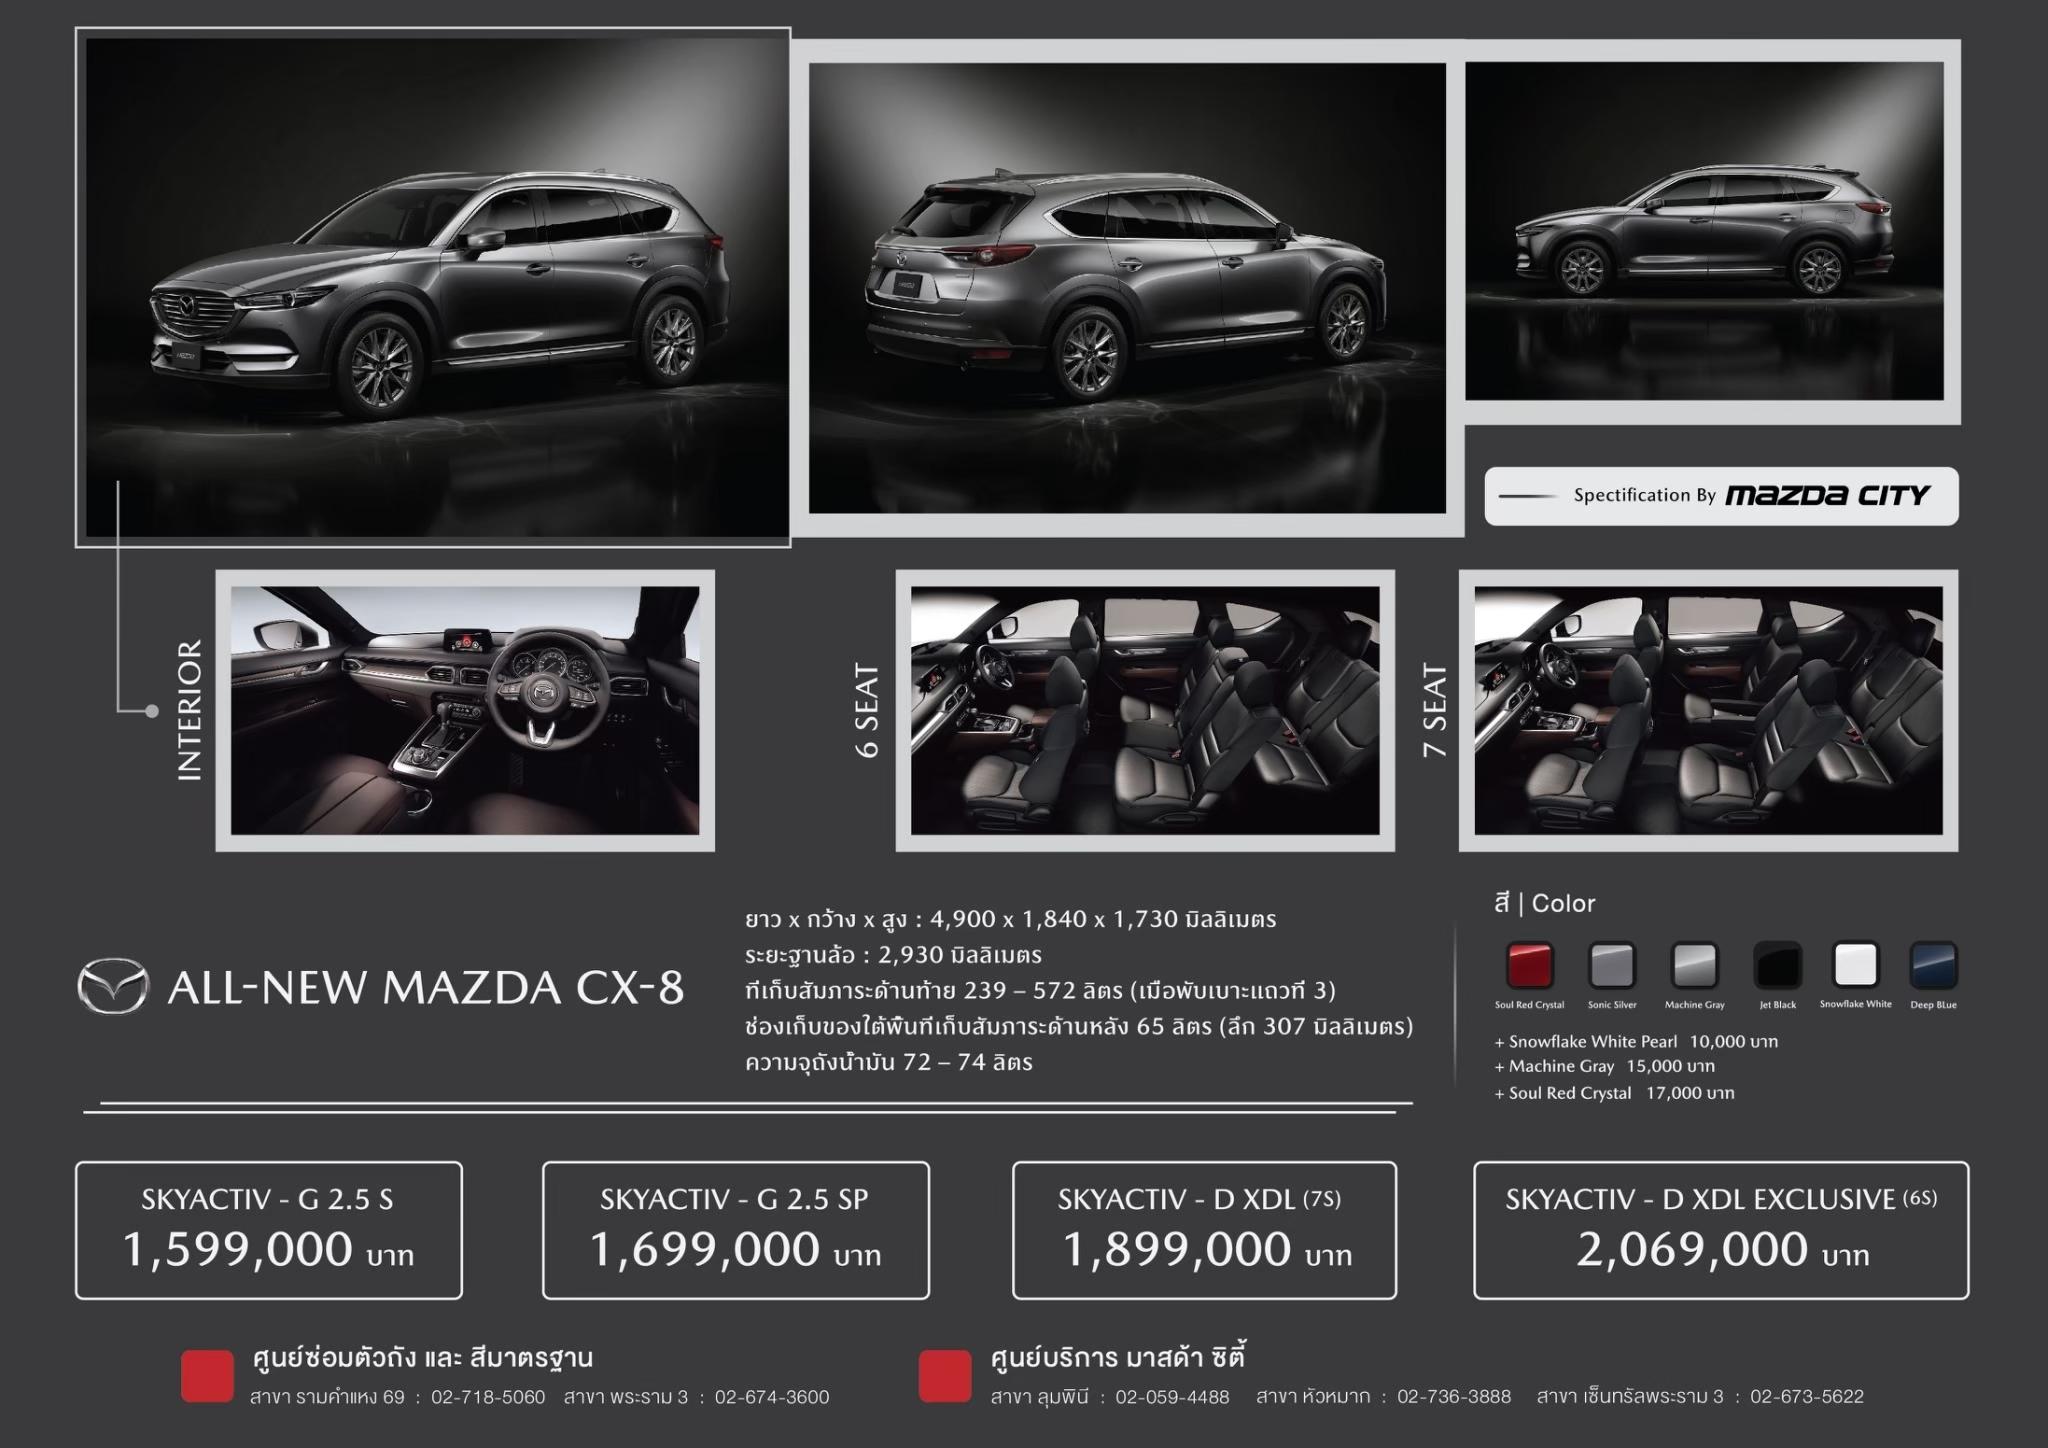 Spectification-Mazda_210325_1